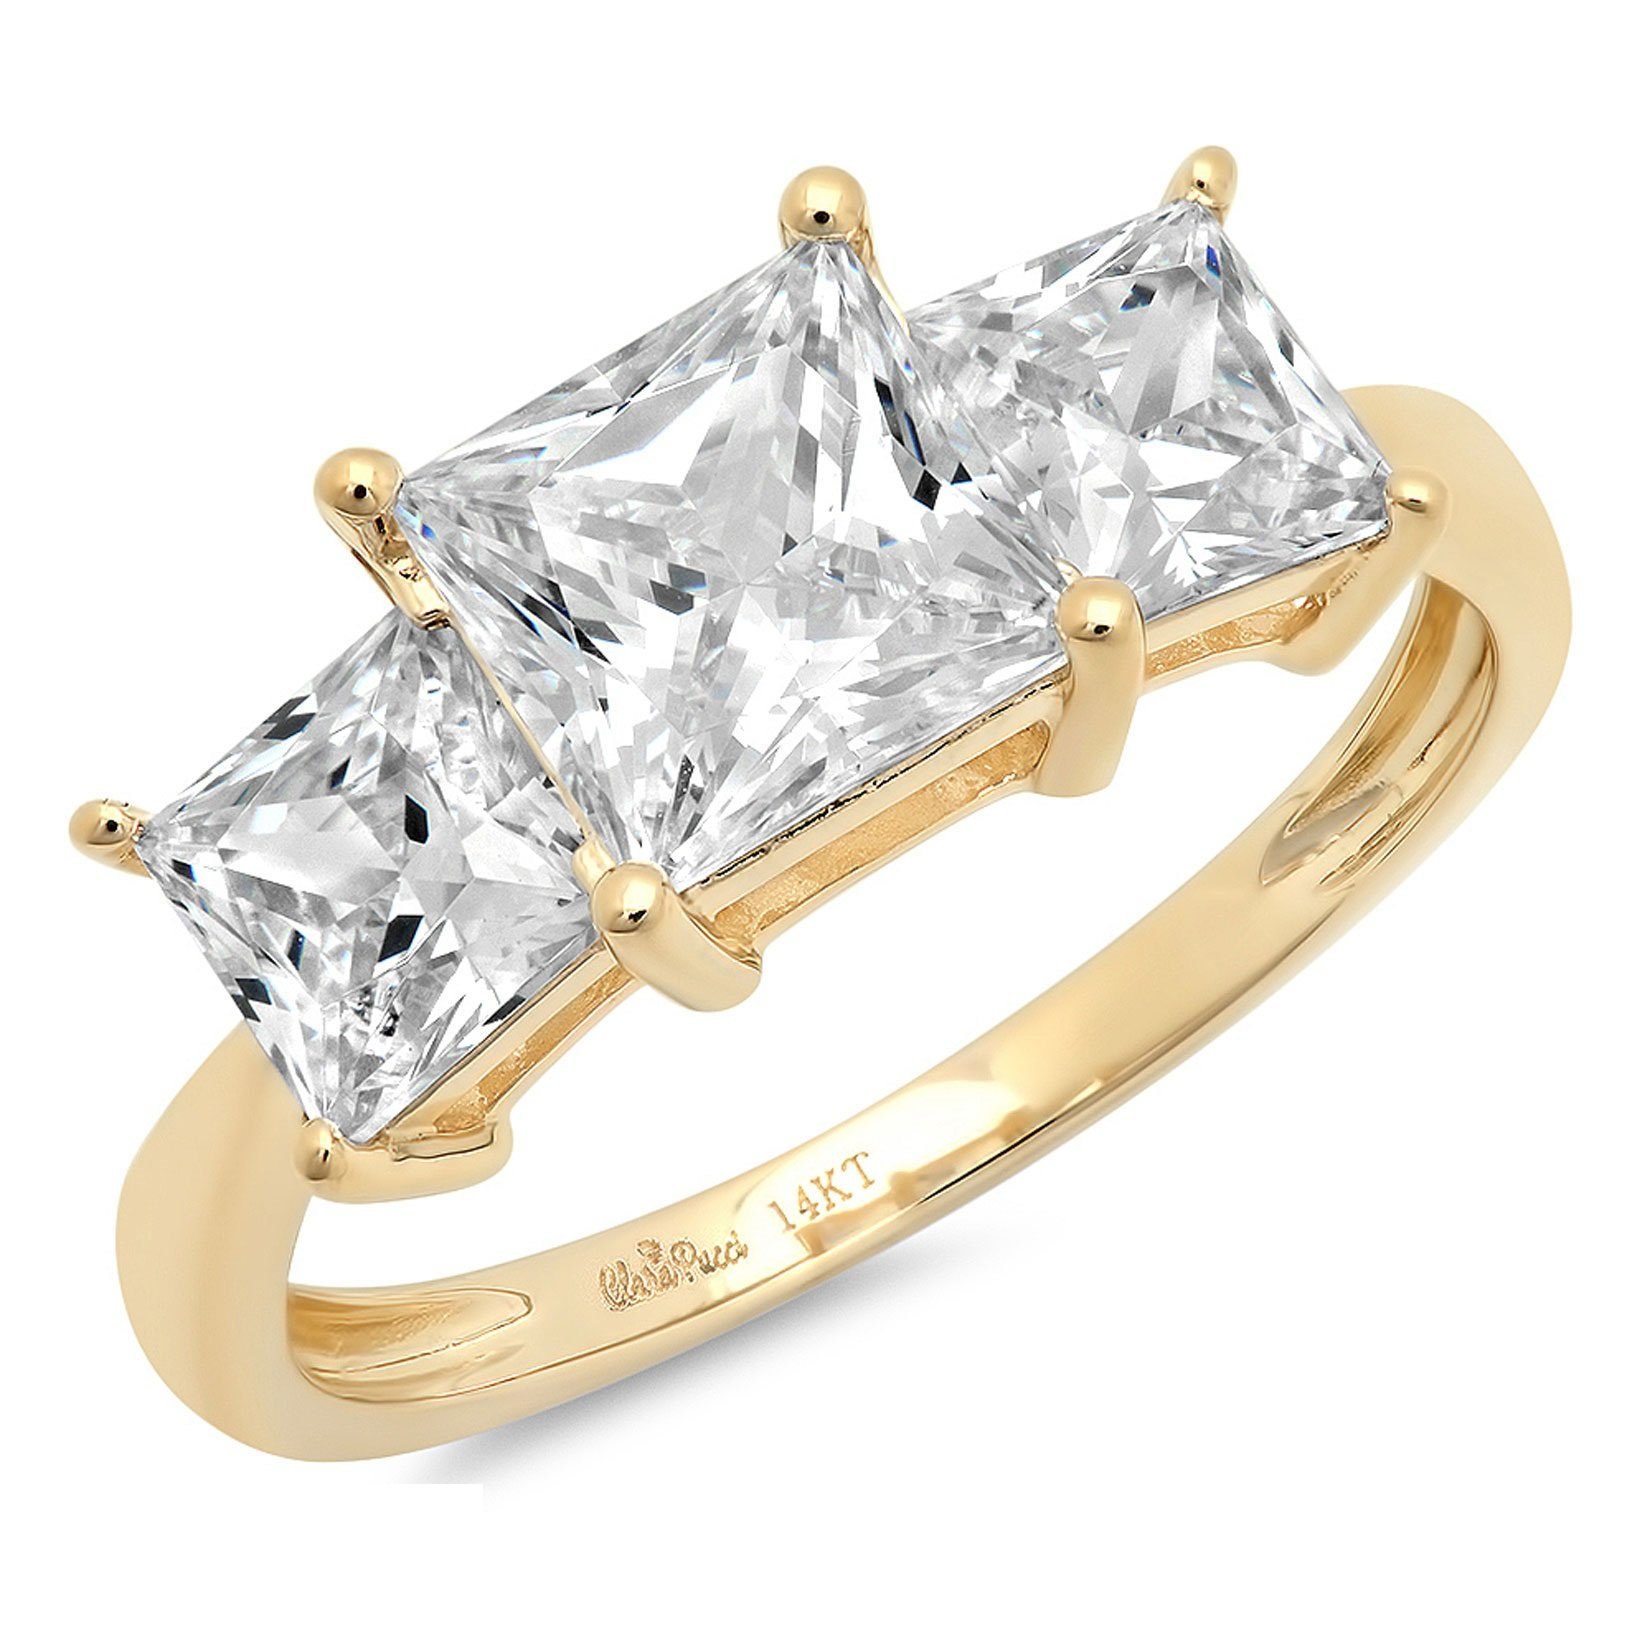 Clara Pucci 2.9 CT Three Stone Princess Cut Ring Engagement Wedding Band 14K Yellow Gold, Size 8